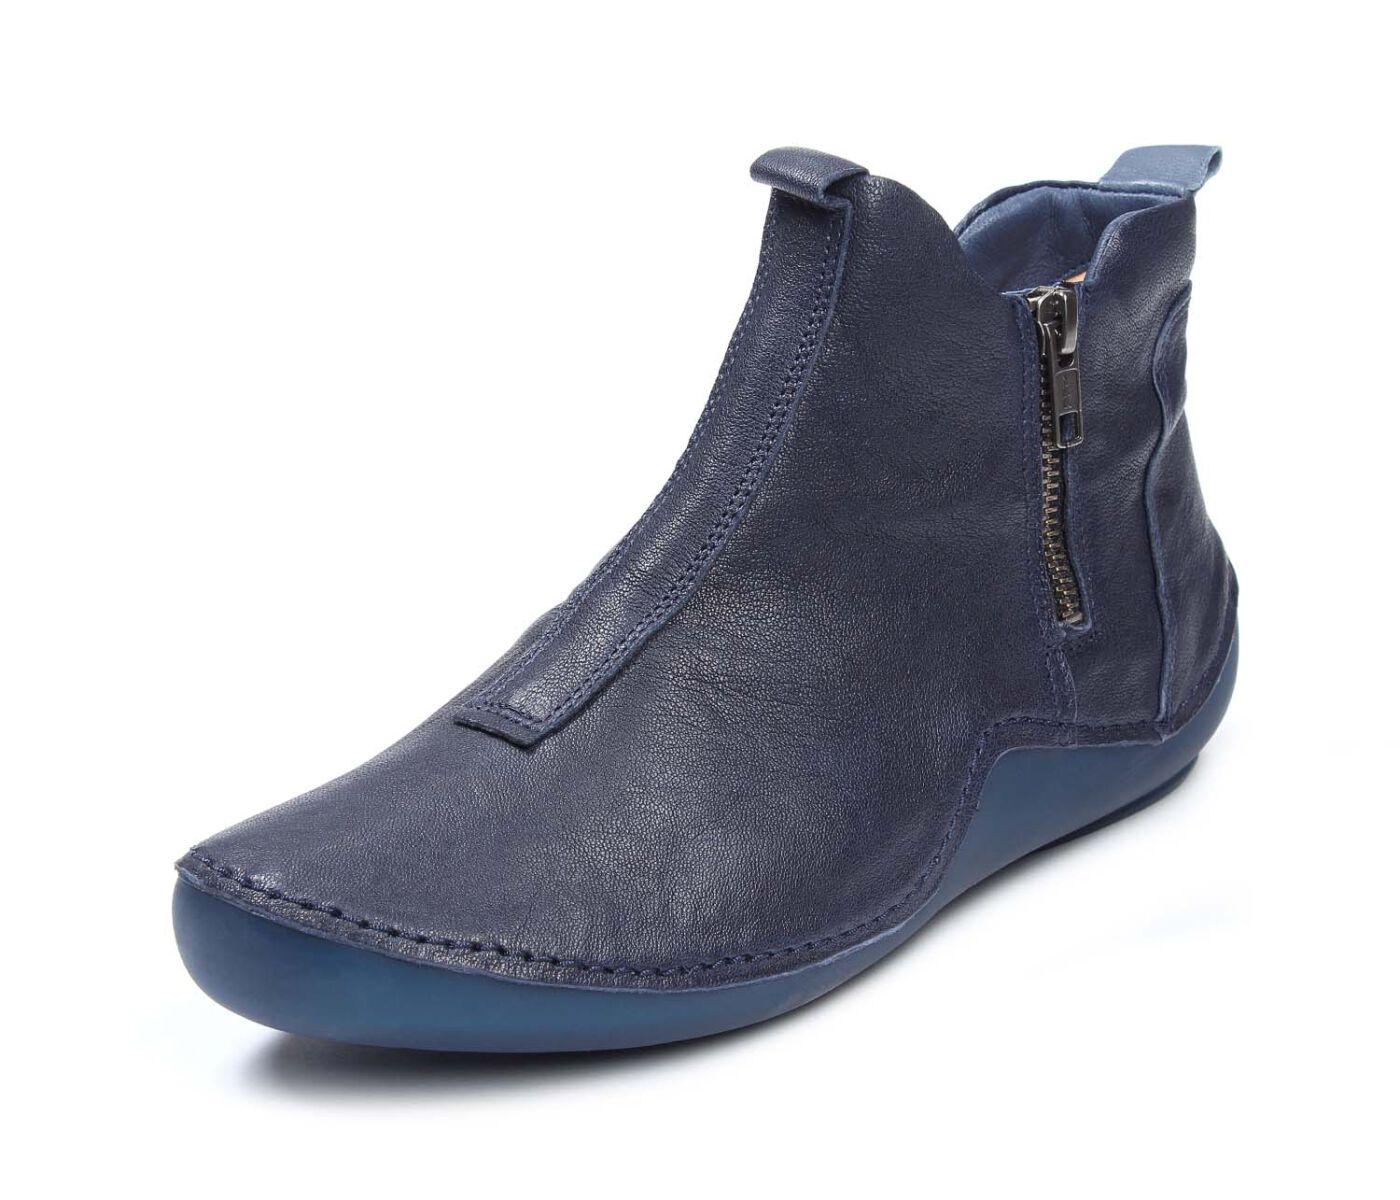 Think Sneaker Boot KAPSL Ocean Blau Leder Einlagen 3 000047 8000 Stiefelette